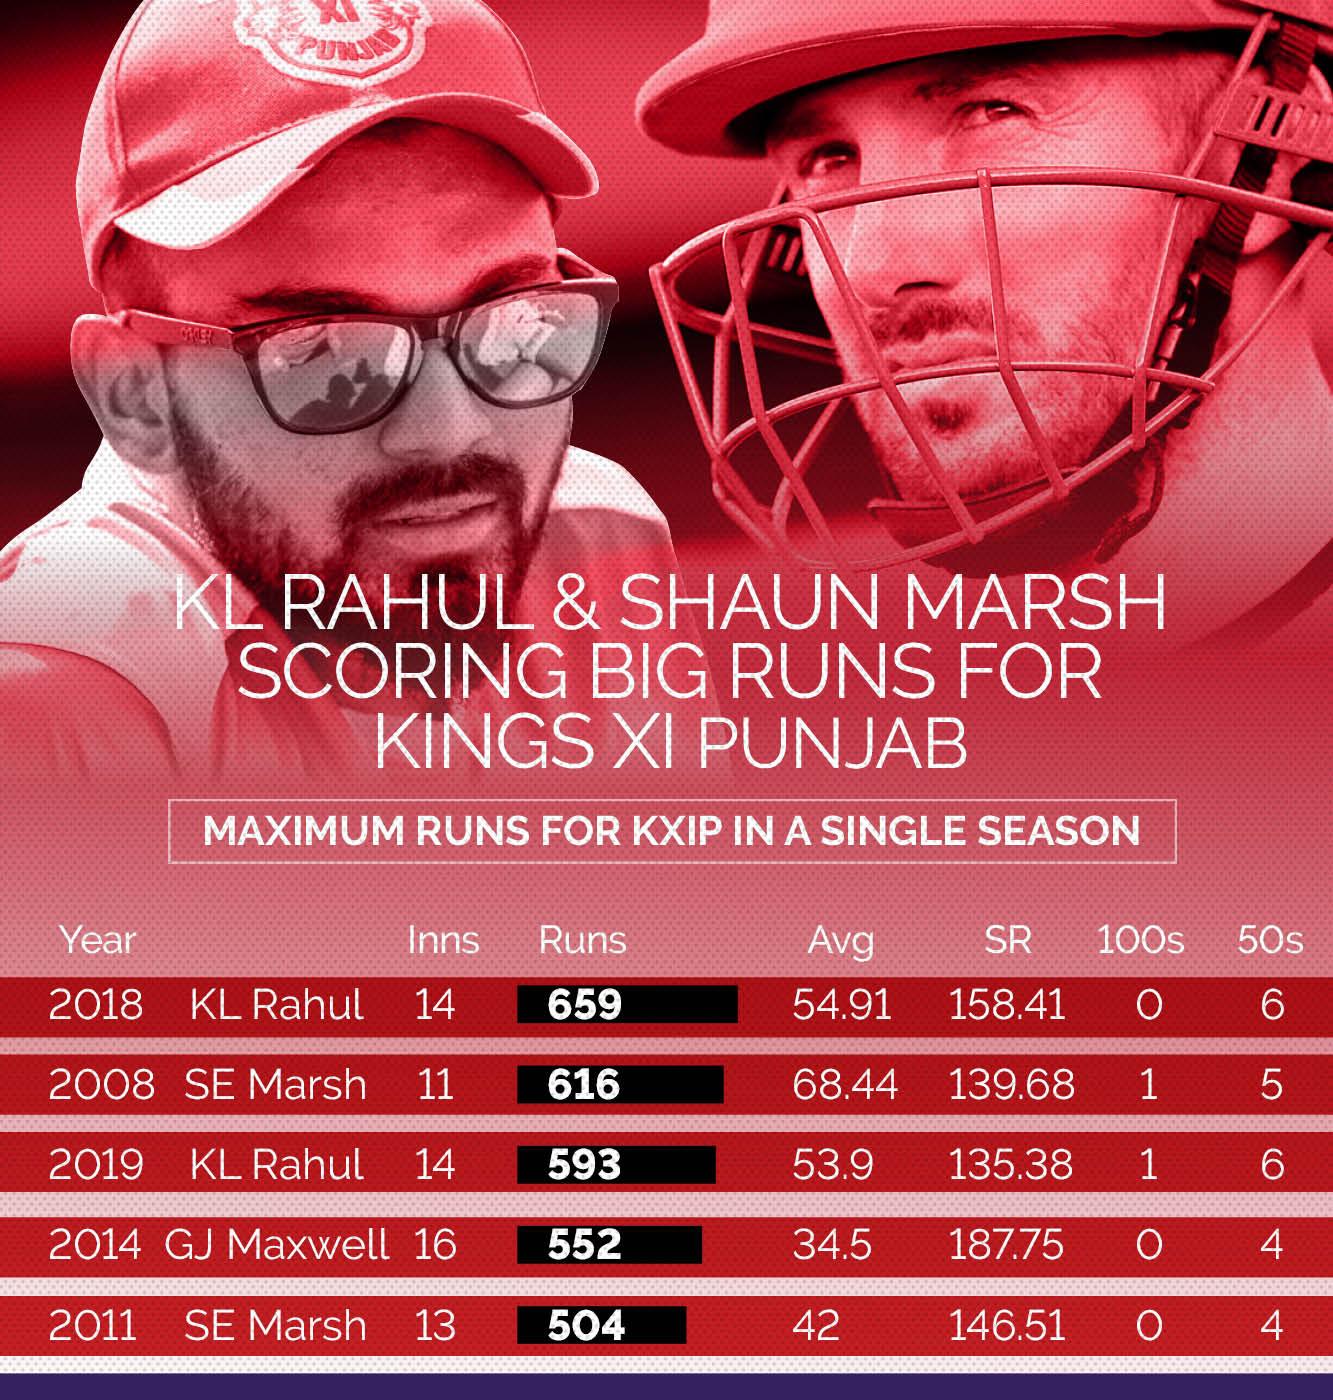 Ipl 2020 Memorable 2014 Kl Rahul S Form Glenn Maxwell S Hits Numbers That Define Kings Xi Punjab Yahoo Cricket